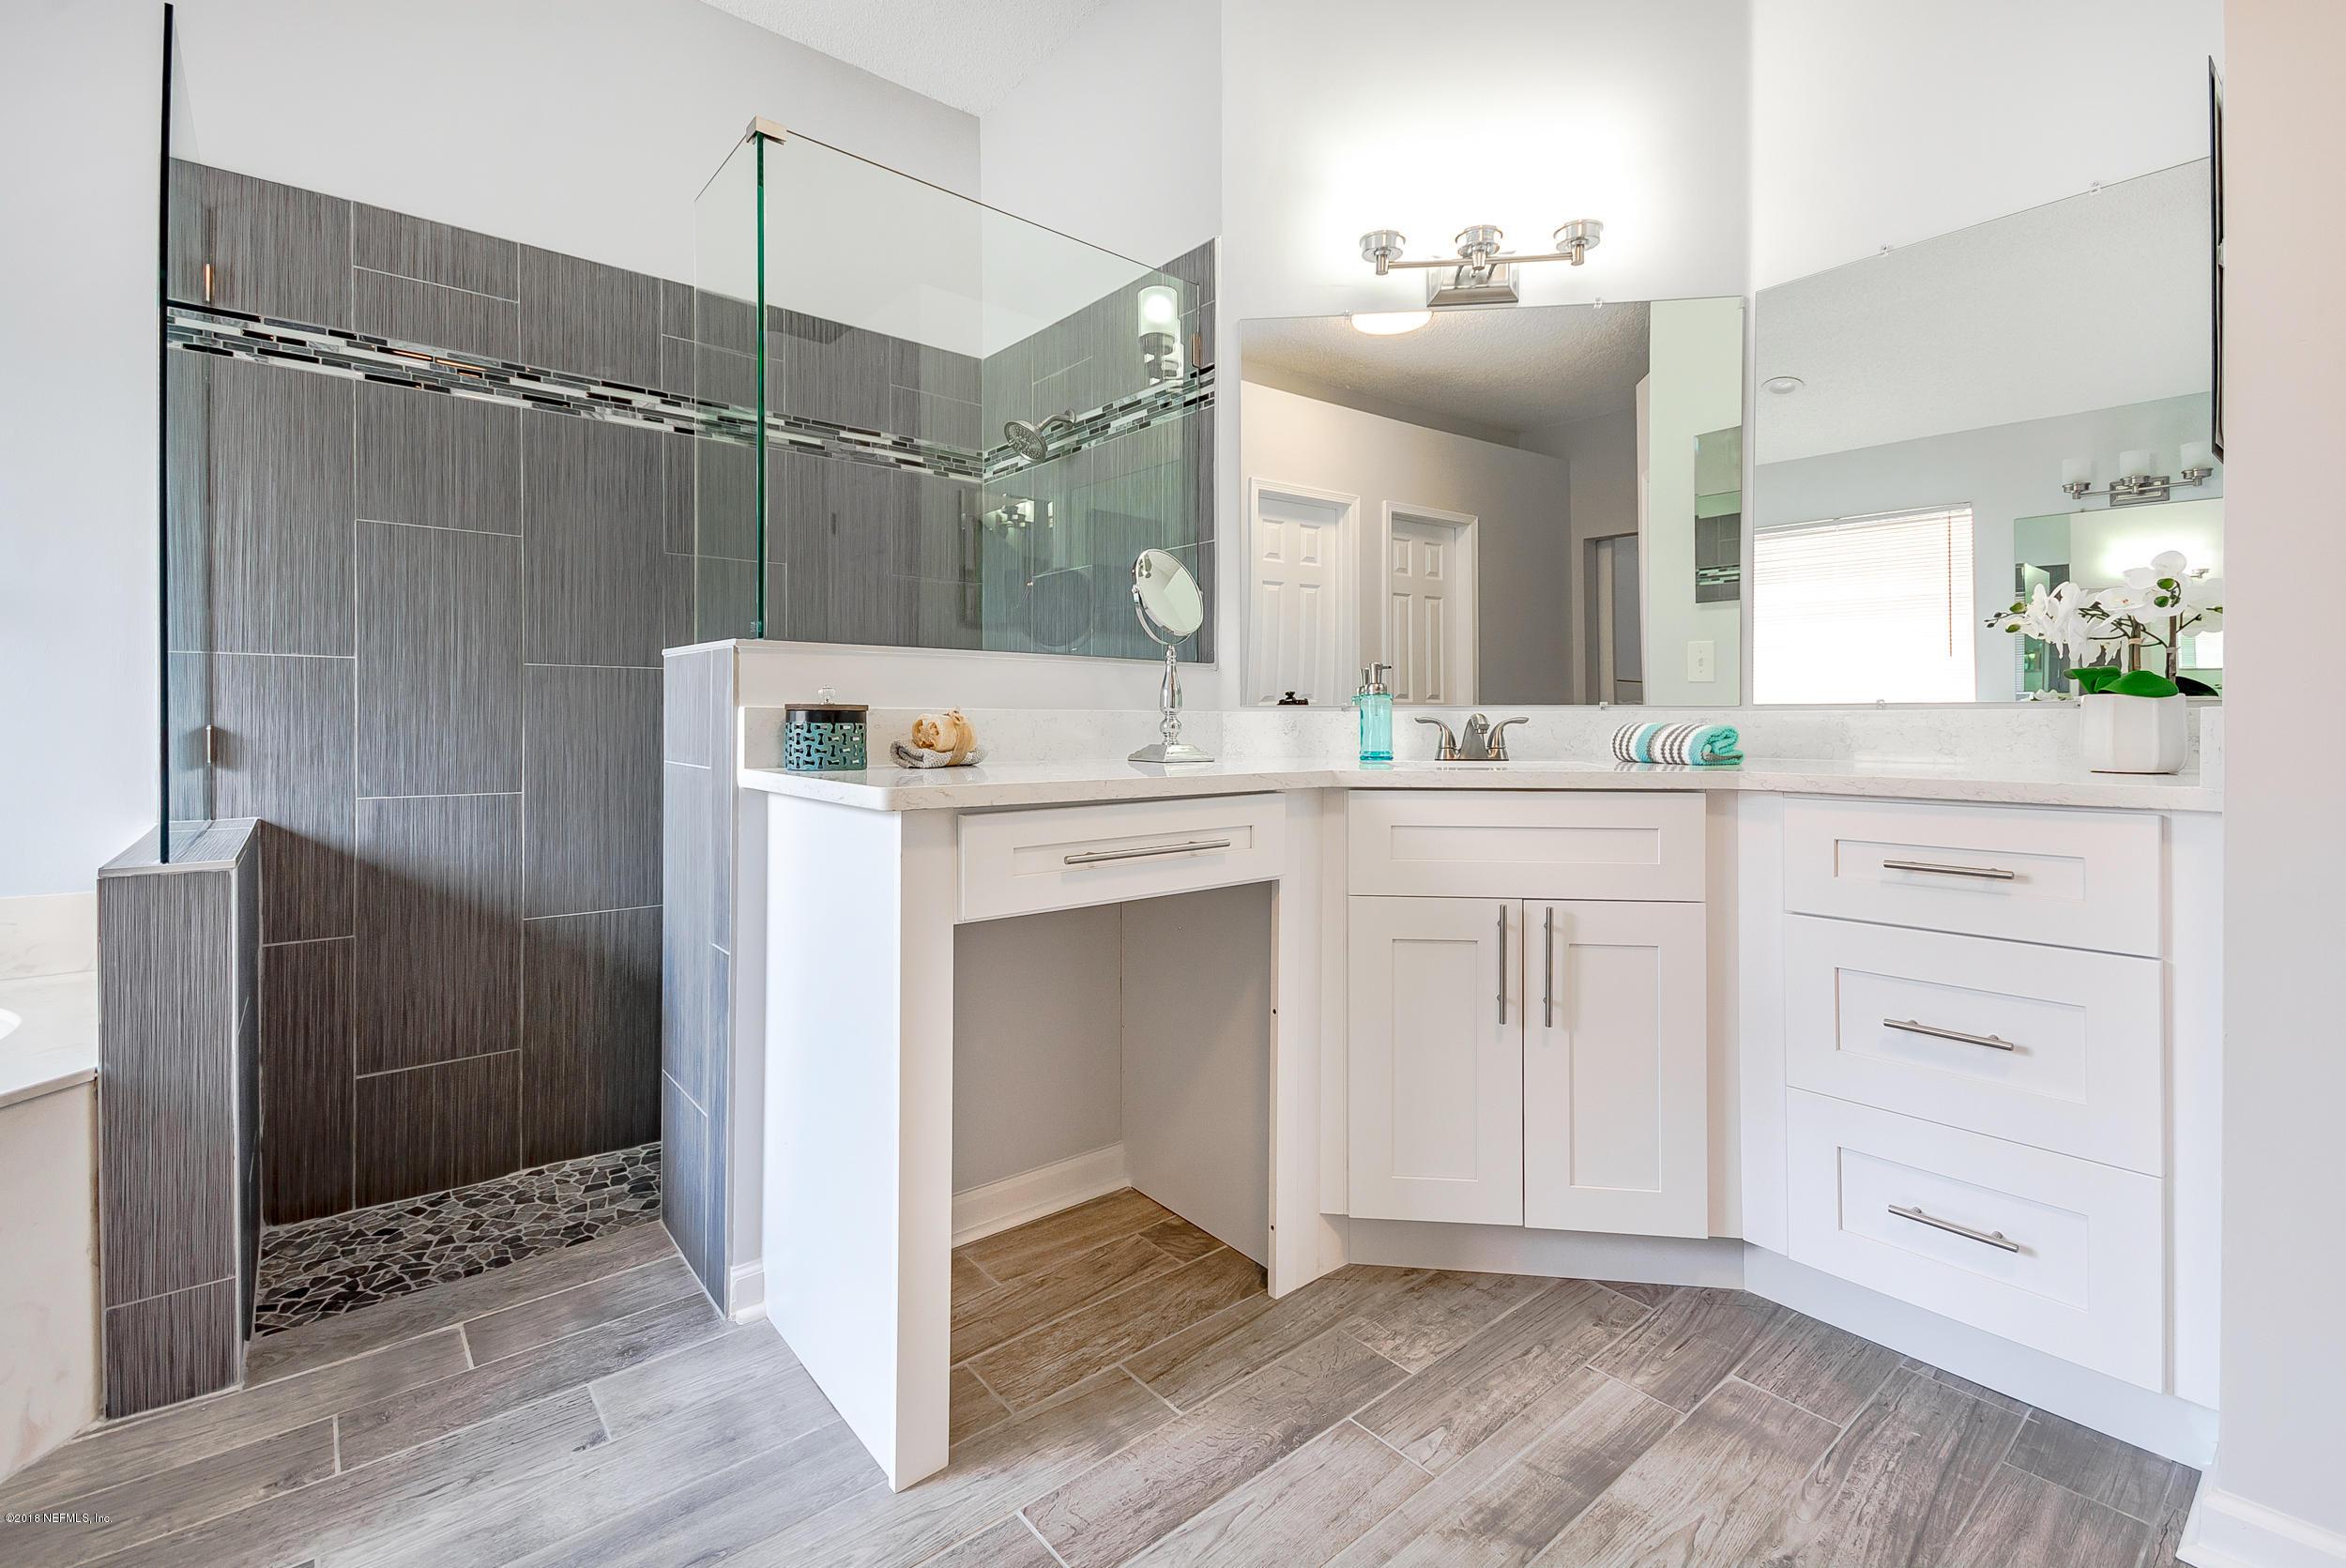 1084 LARKSPUR, JACKSONVILLE, FLORIDA 32259, 4 Bedrooms Bedrooms, ,2 BathroomsBathrooms,Residential - single family,For sale,LARKSPUR,954019